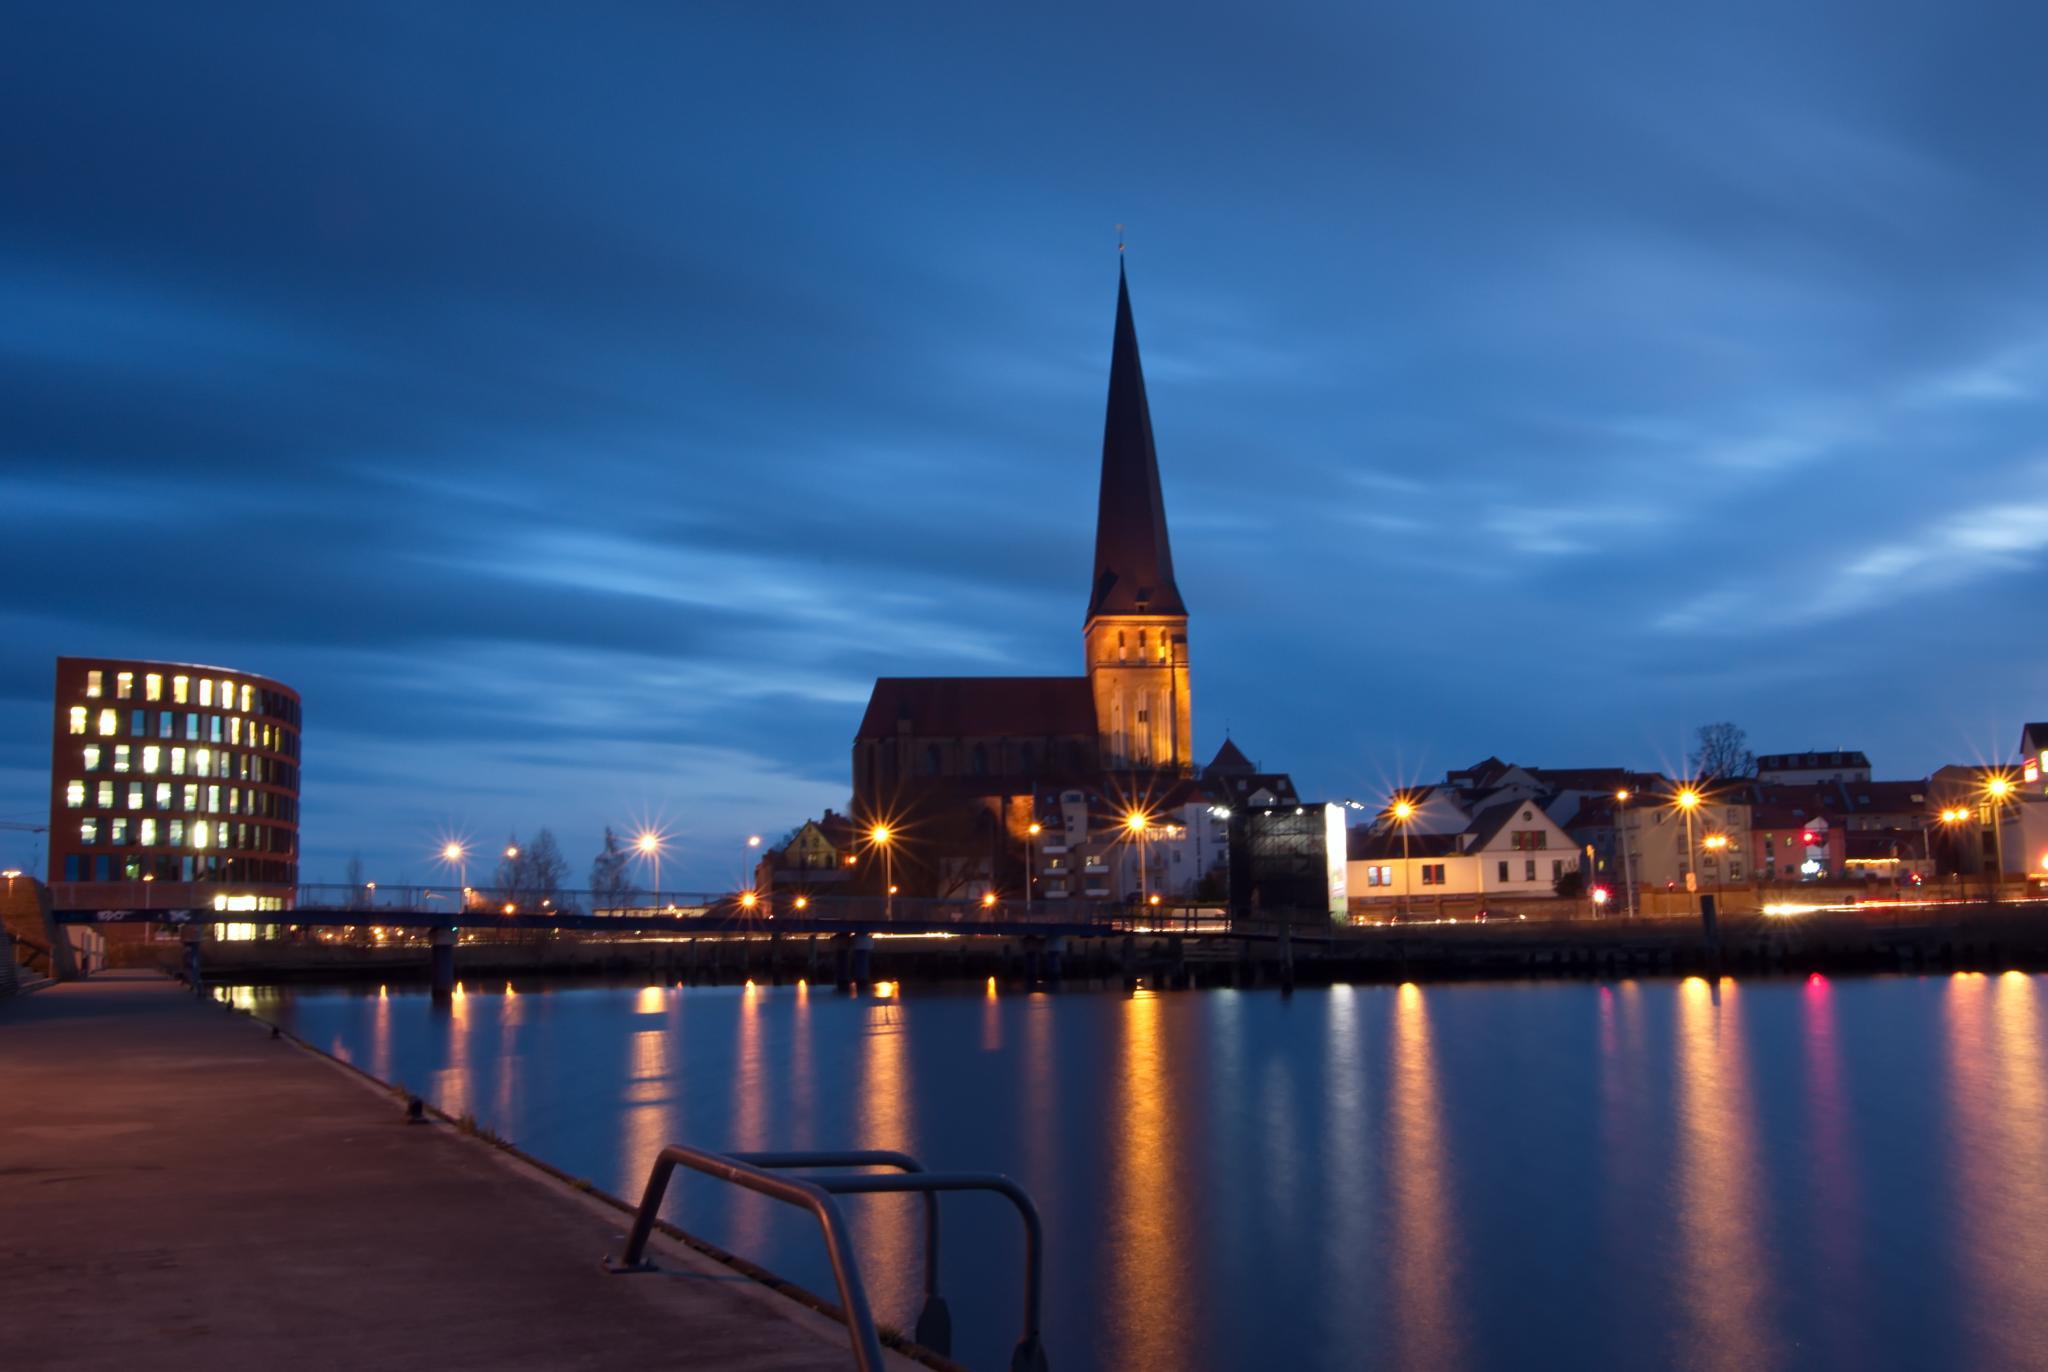 Petrikirche Rostock by diplompunk